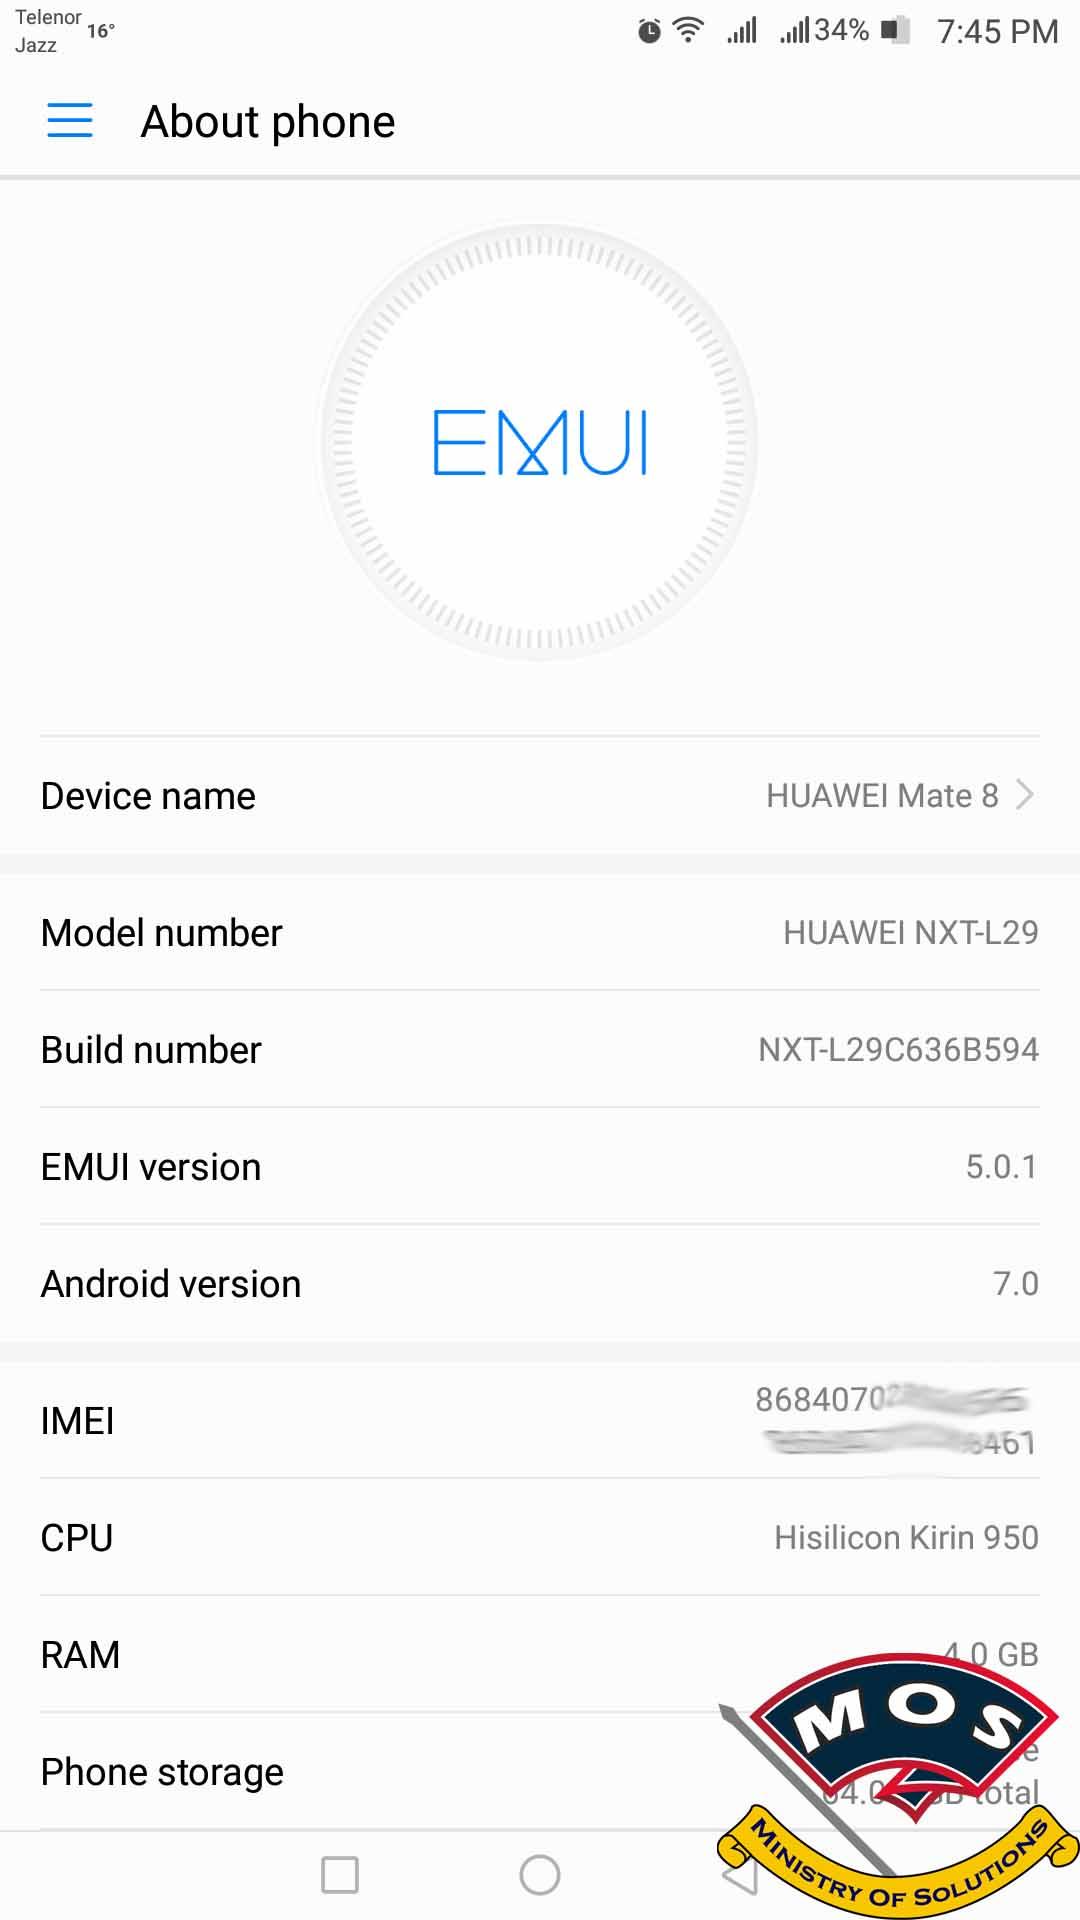 Huawei Mate 8 NXT-L29 Nougat B594 Firmware (Asia Pacific